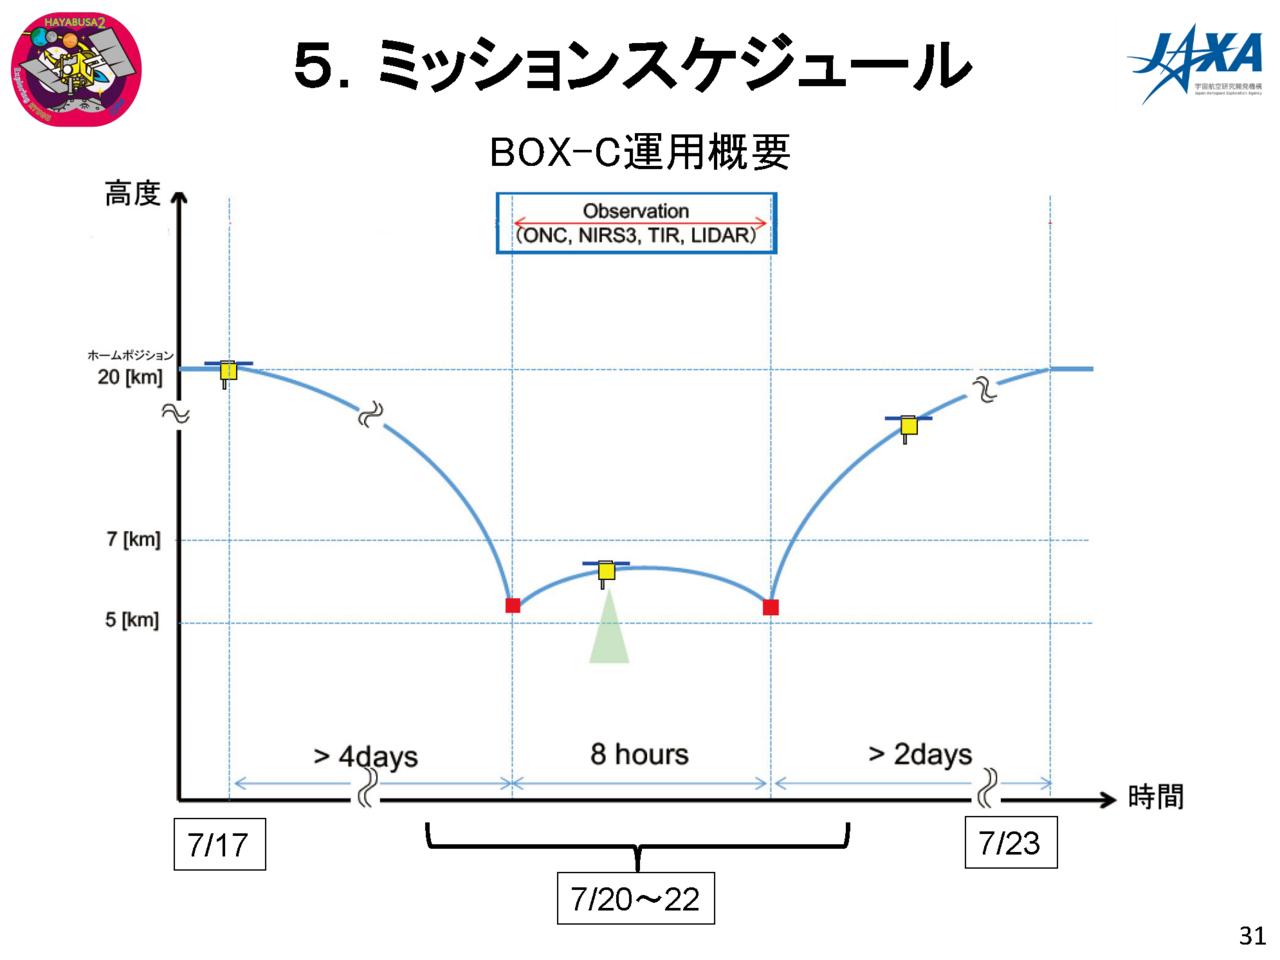 f:id:Imamura:20180719131726p:plain